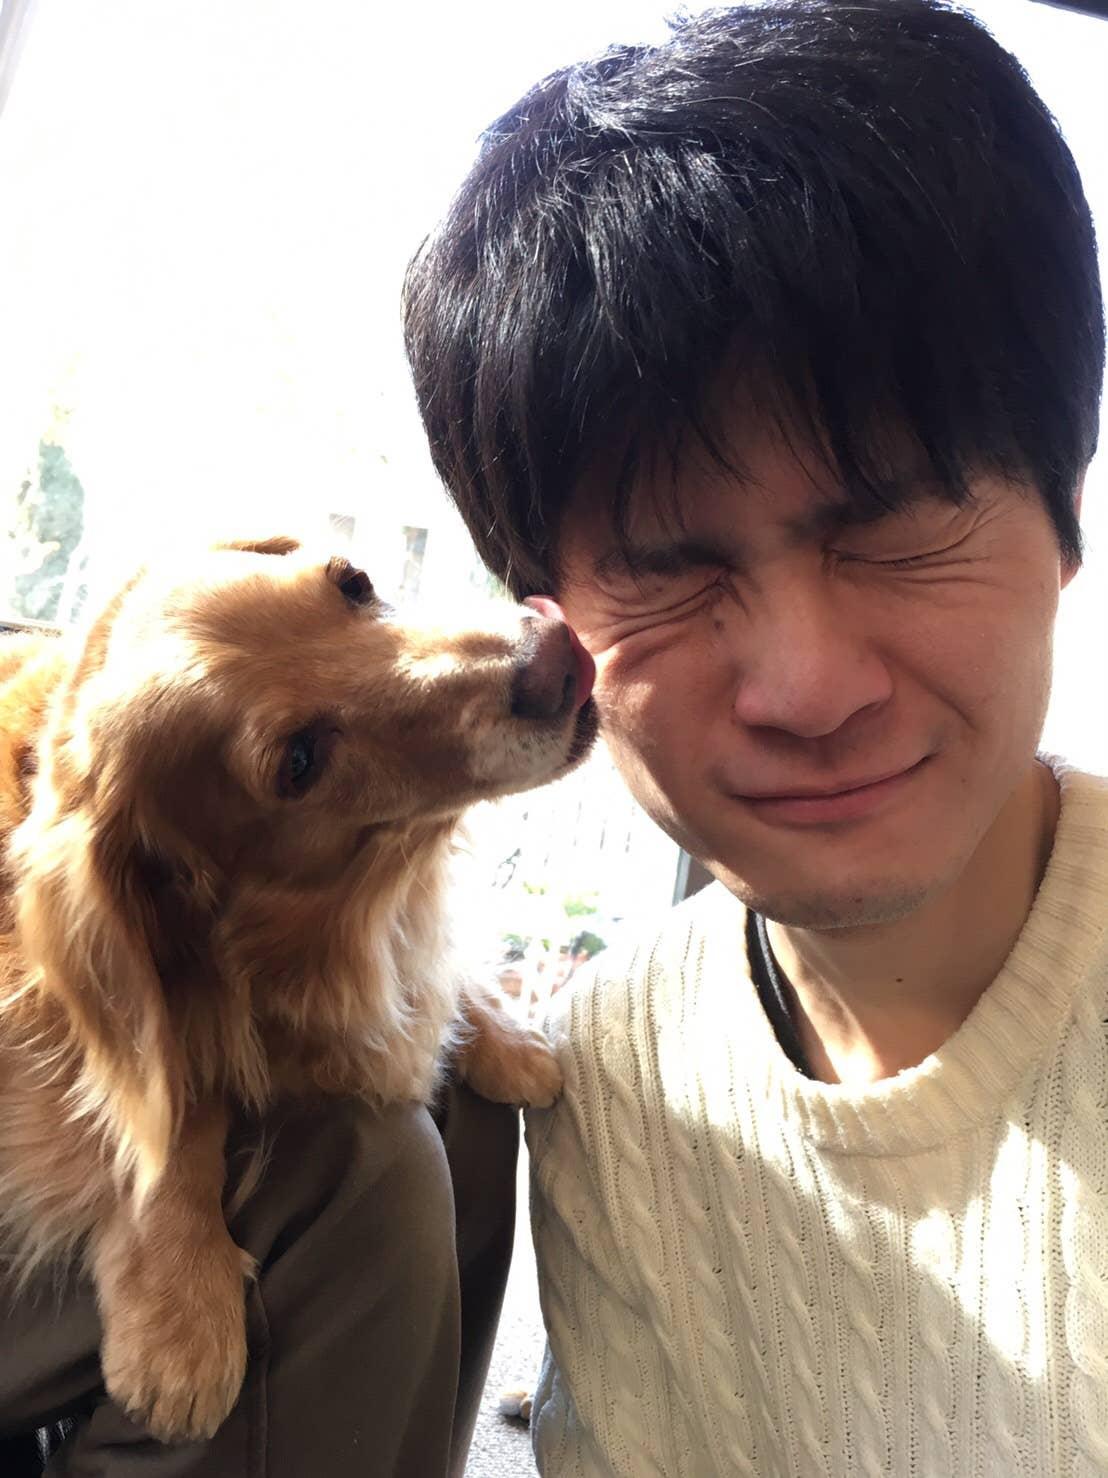 Hiroyuki Nomura